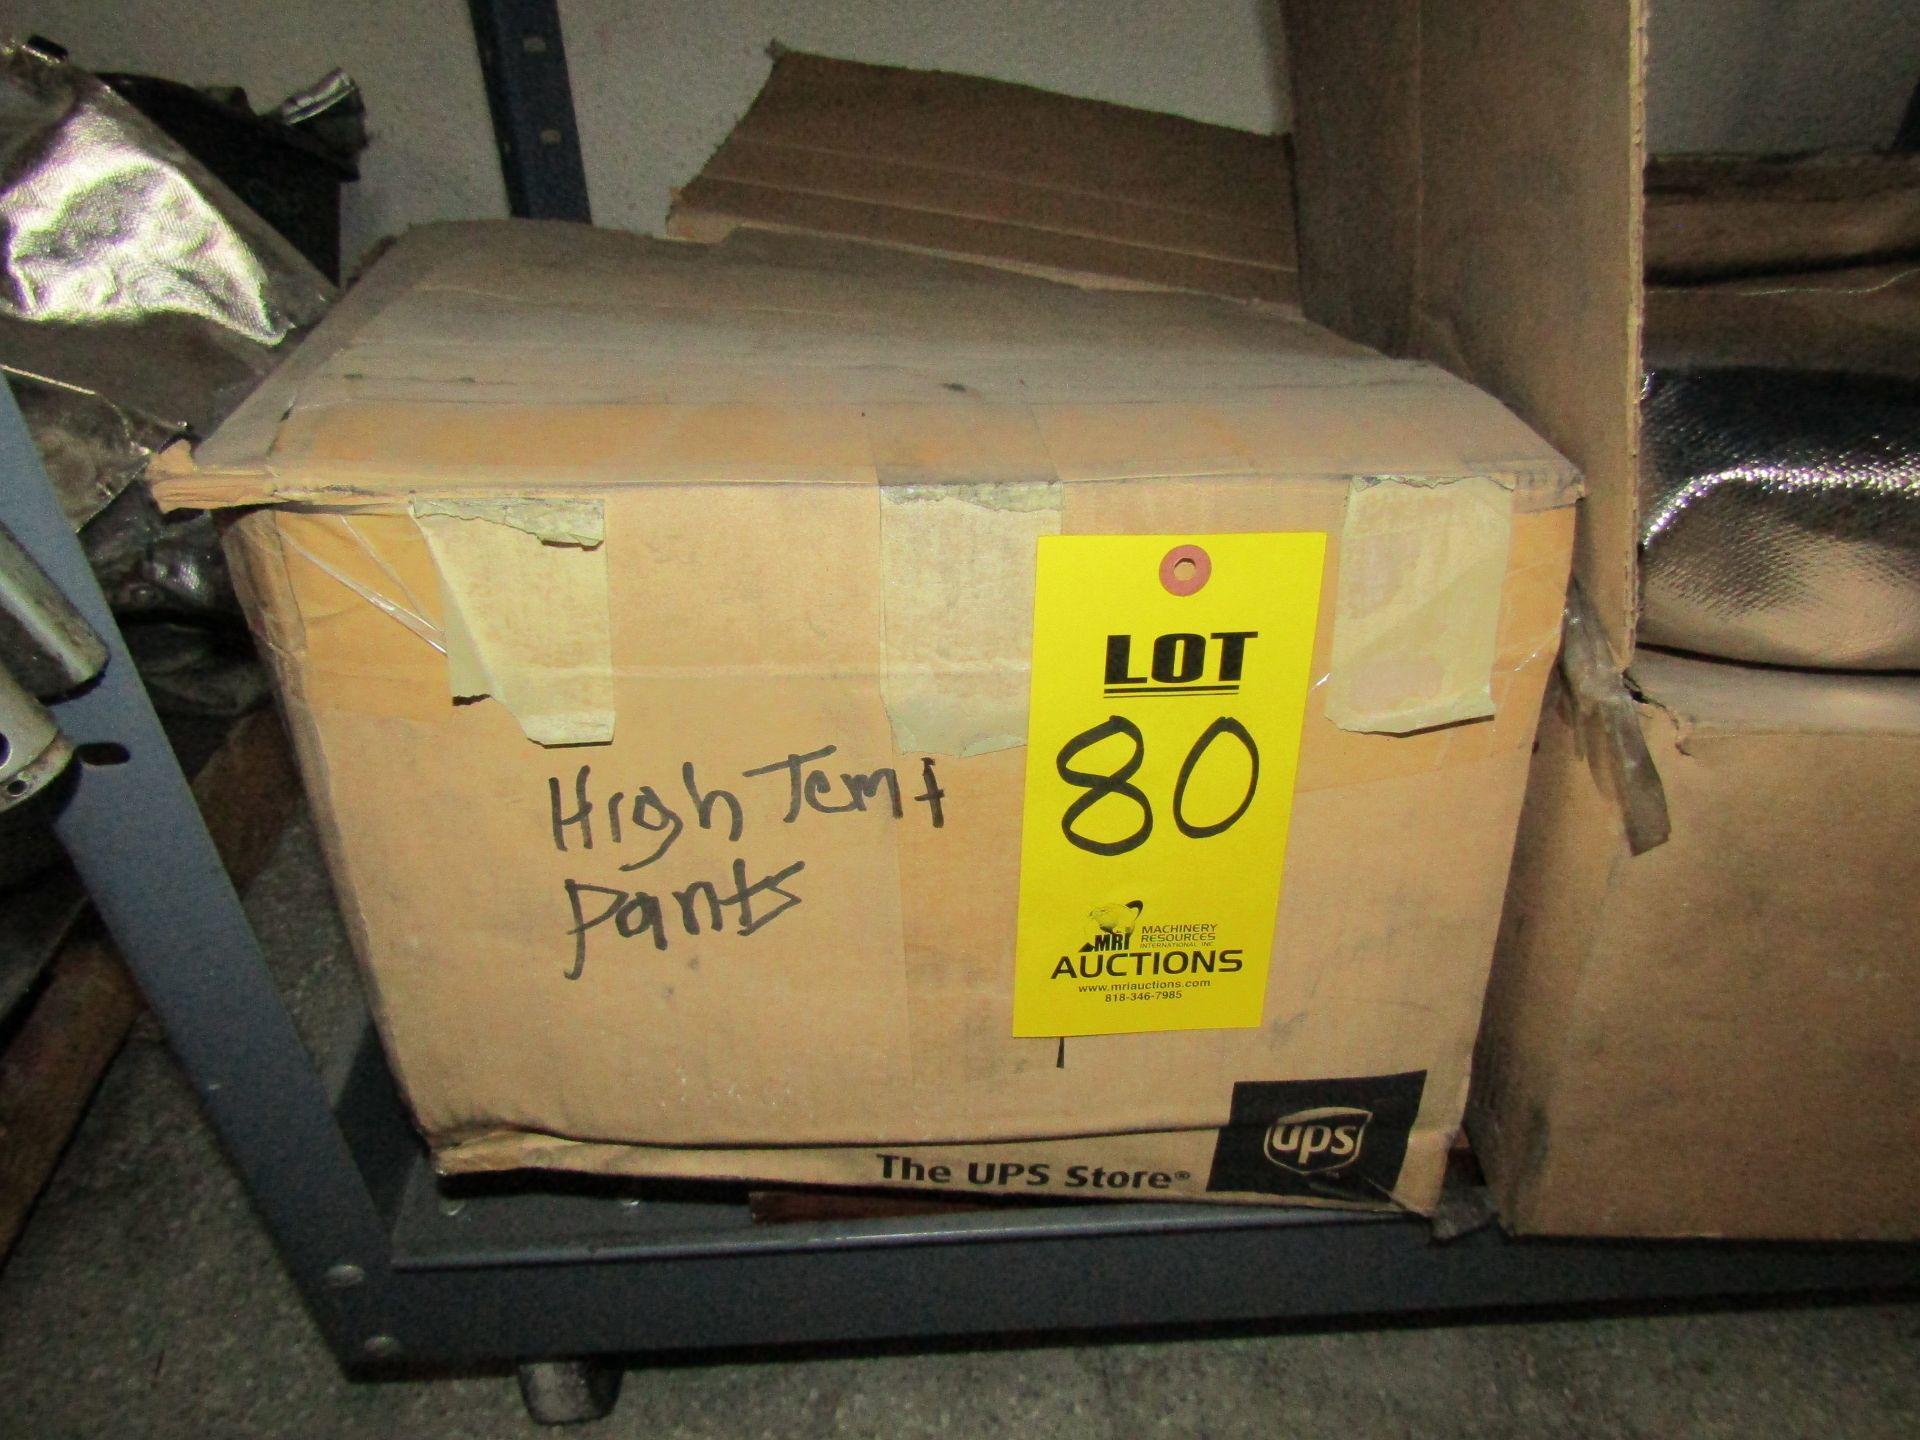 Lot 80 - Box of High Temperature Pants